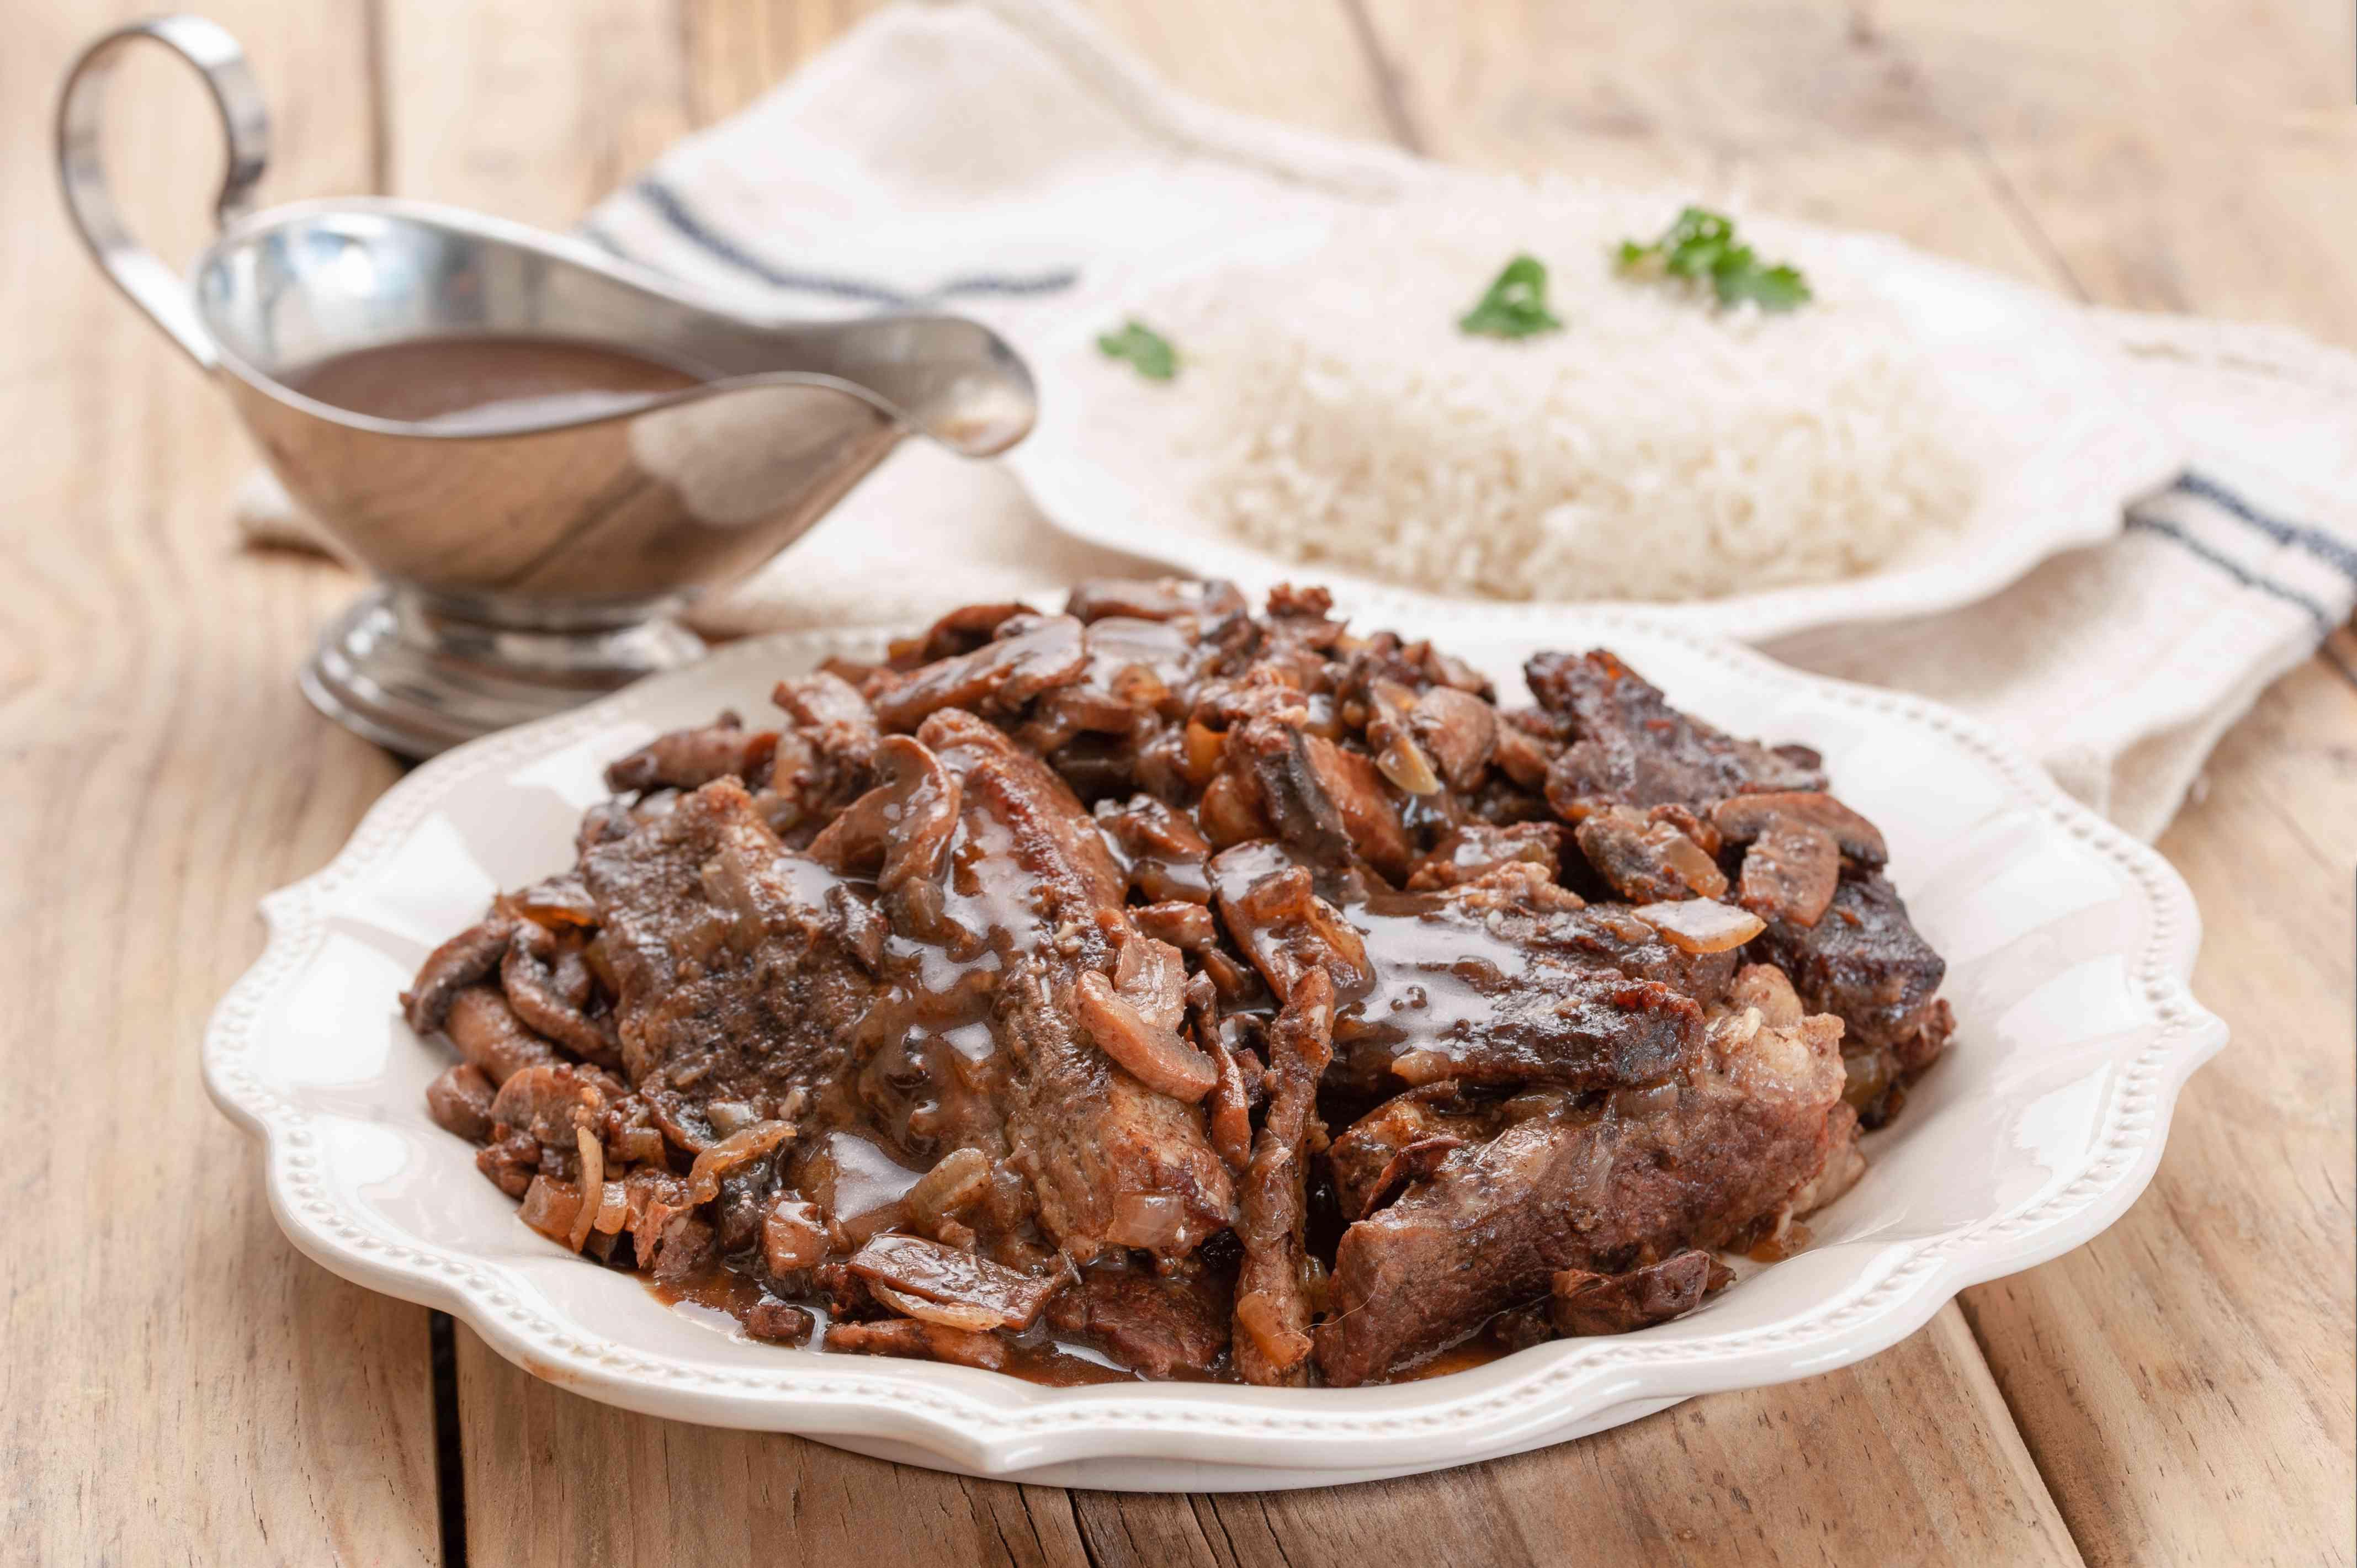 Slow cooker boneless beef short ribs recipe